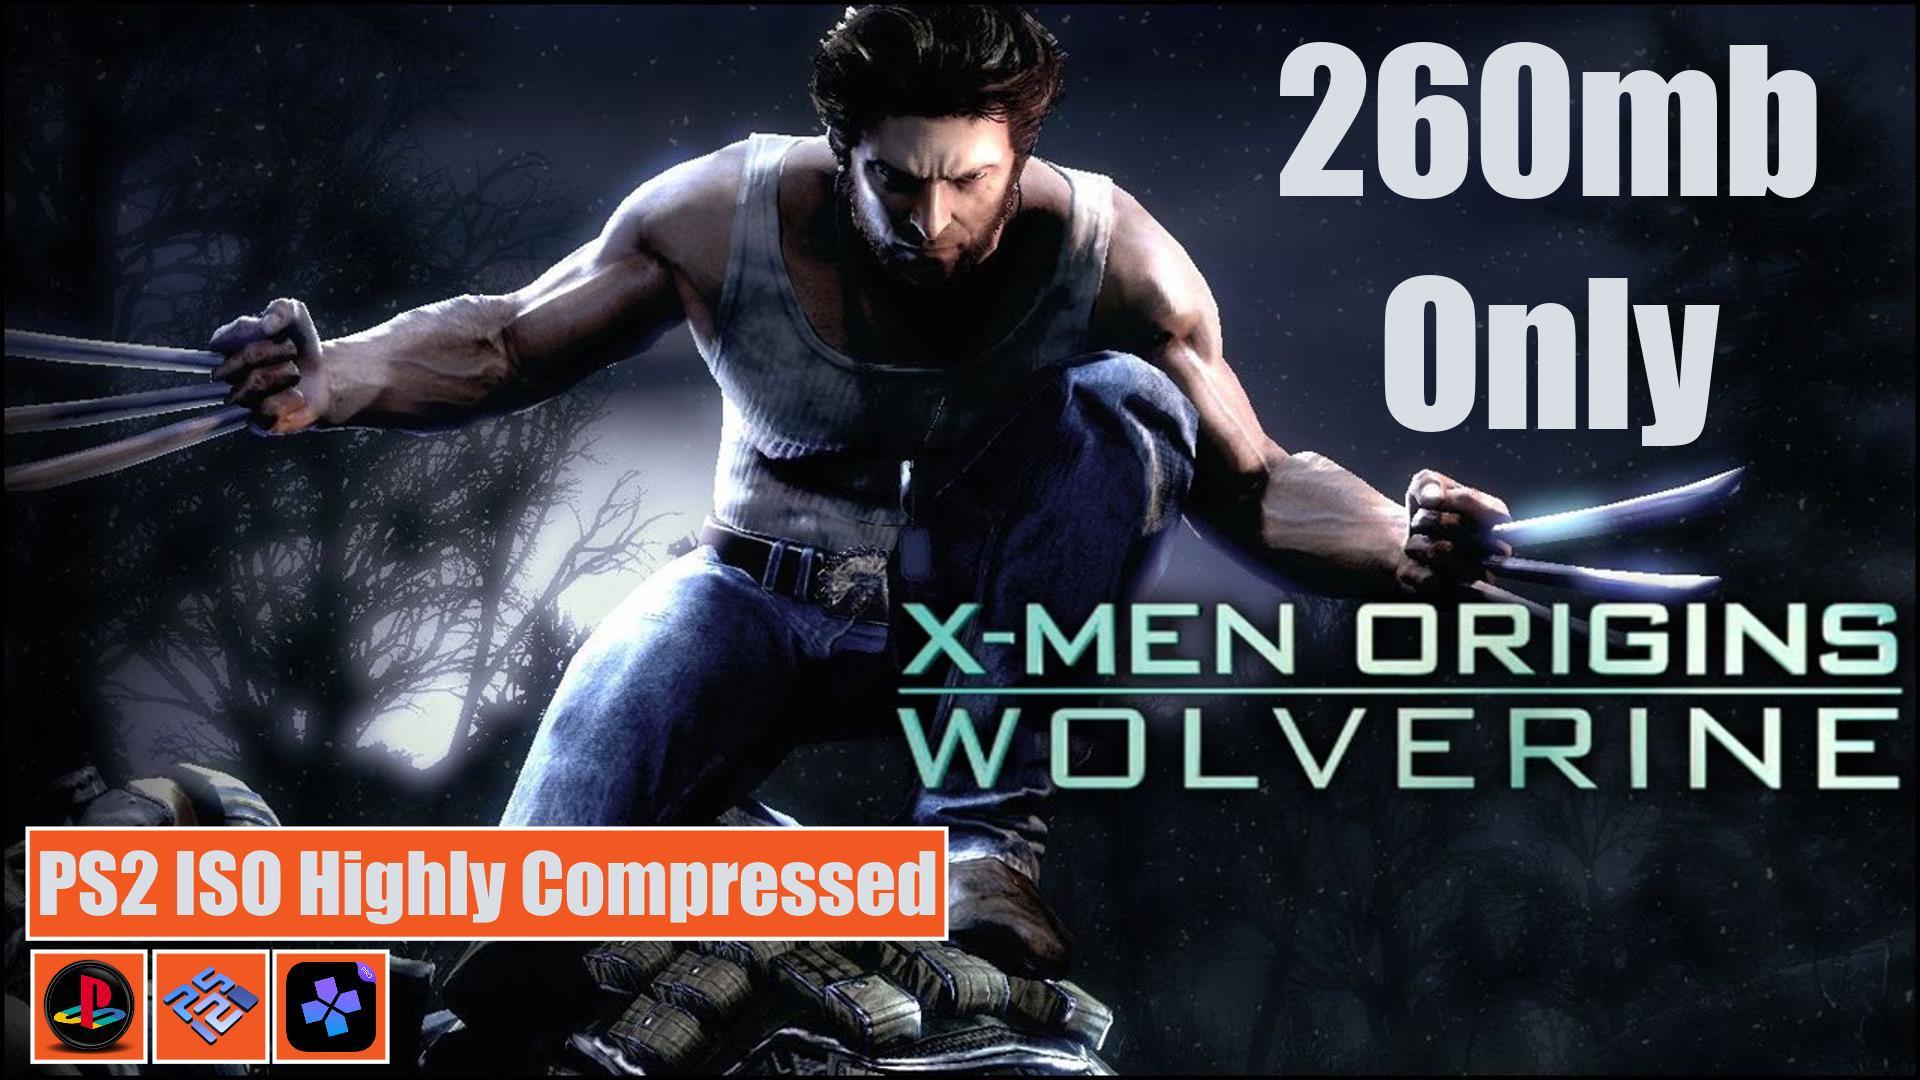 X-Men Origins Wolverine PS2 ISO Highly Compressed